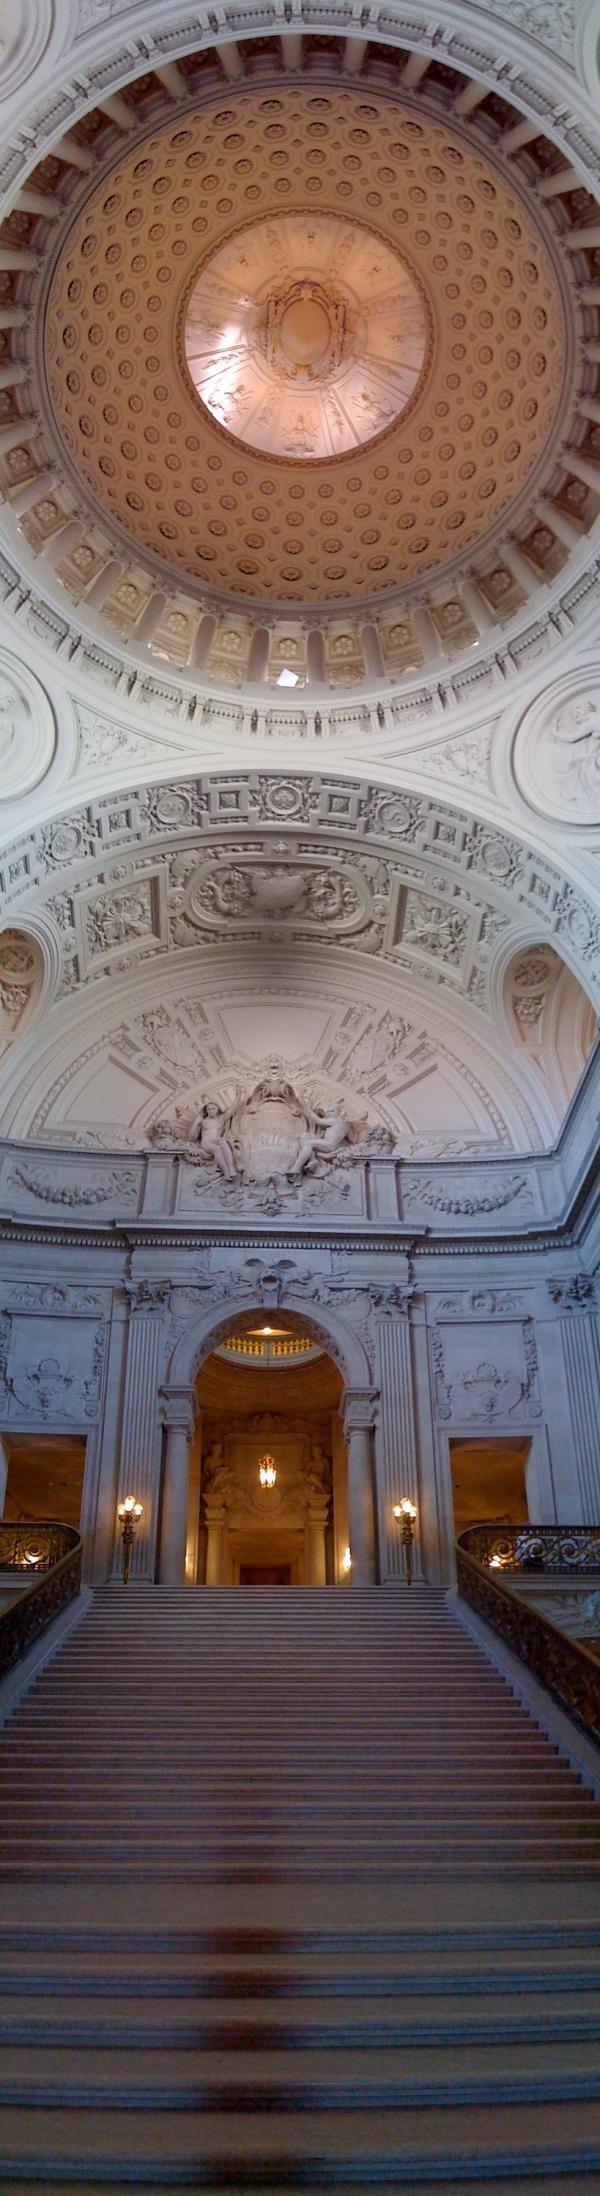 city-hall-dome